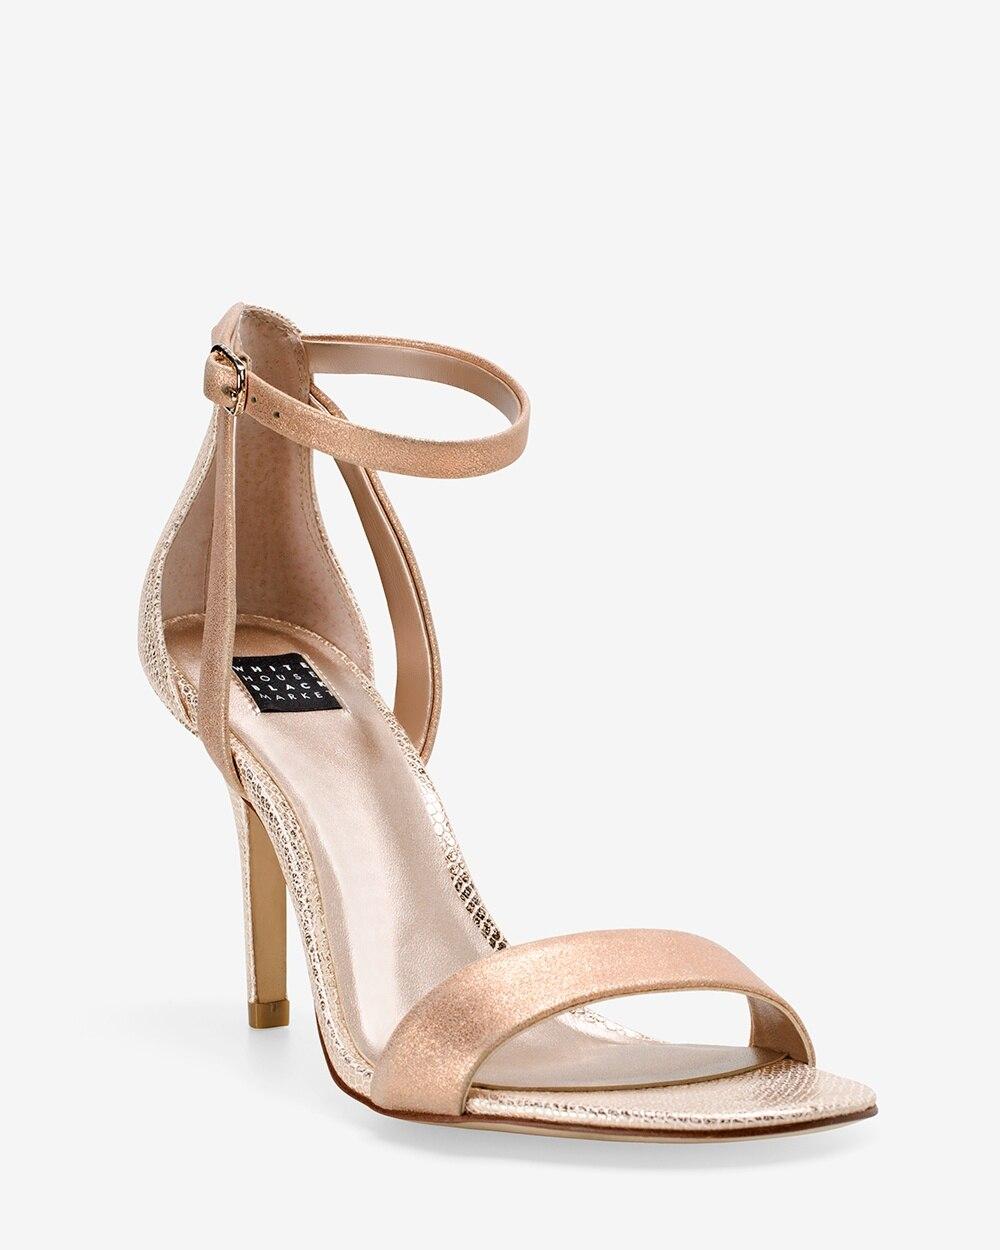 8480c07feb4 Rose Gold Strappy Mid-Heel Sandals - White House Black Market